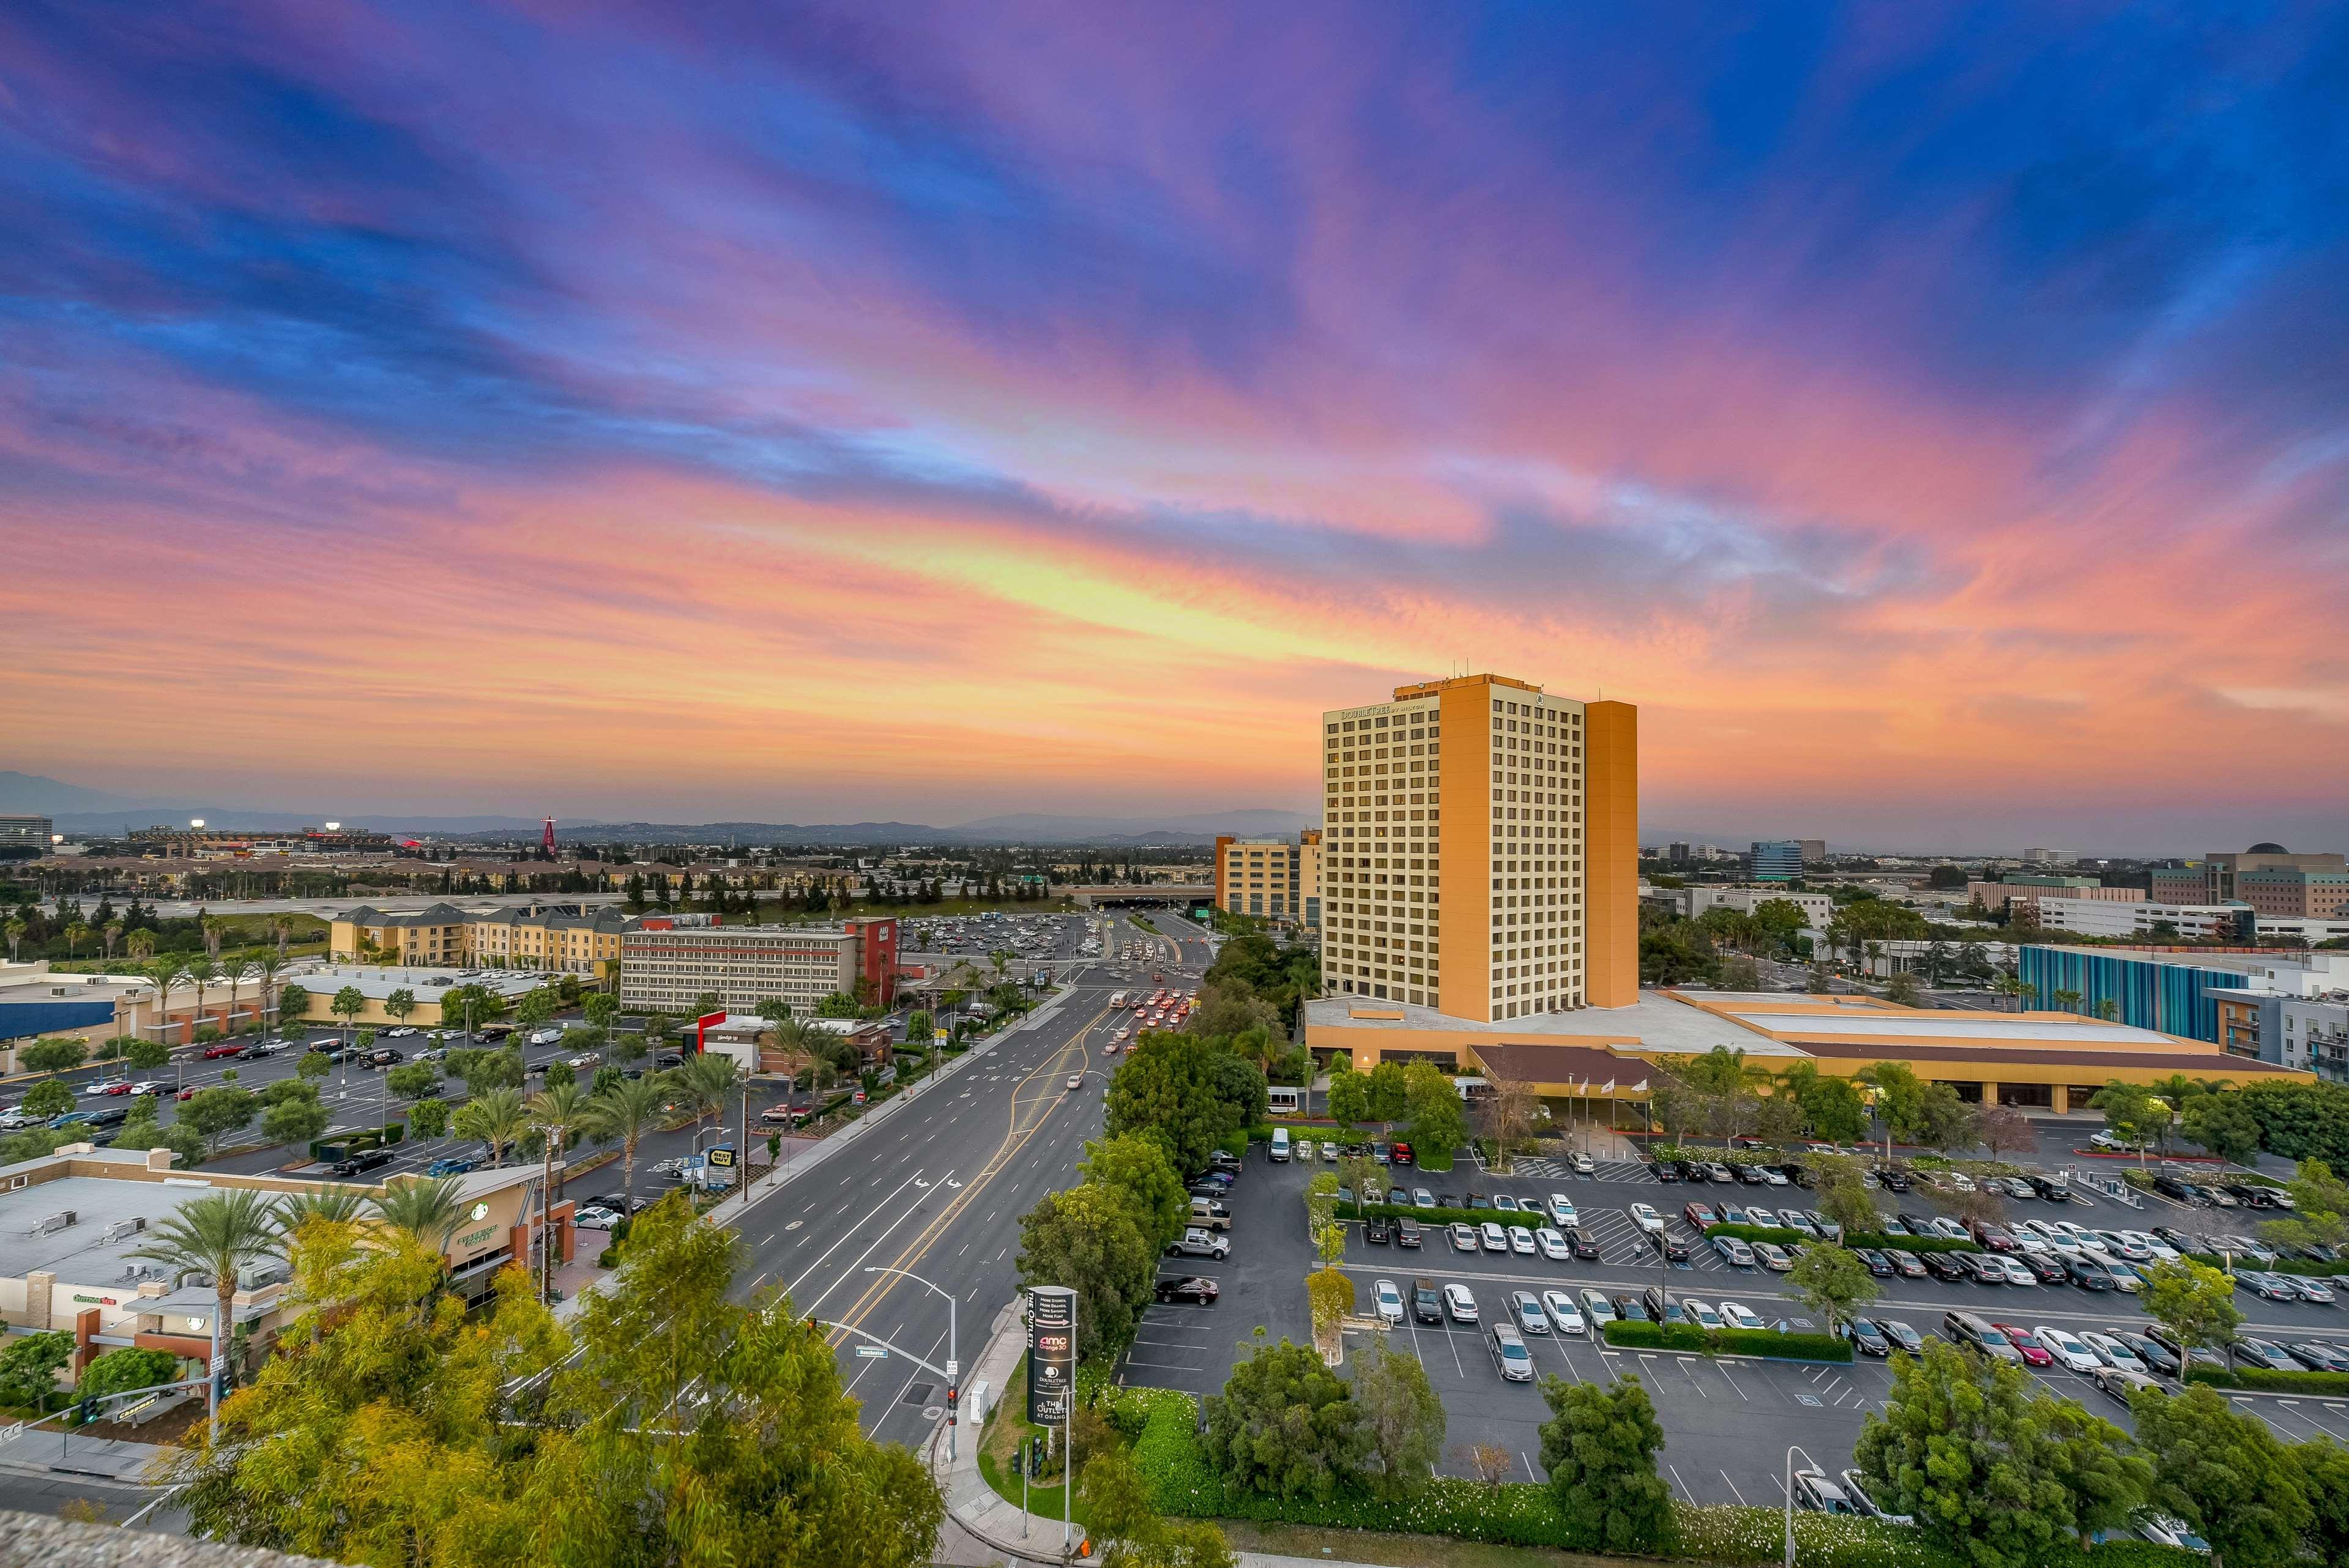 DoubleTree by Hilton Hotel Anaheim - Orange County image 9